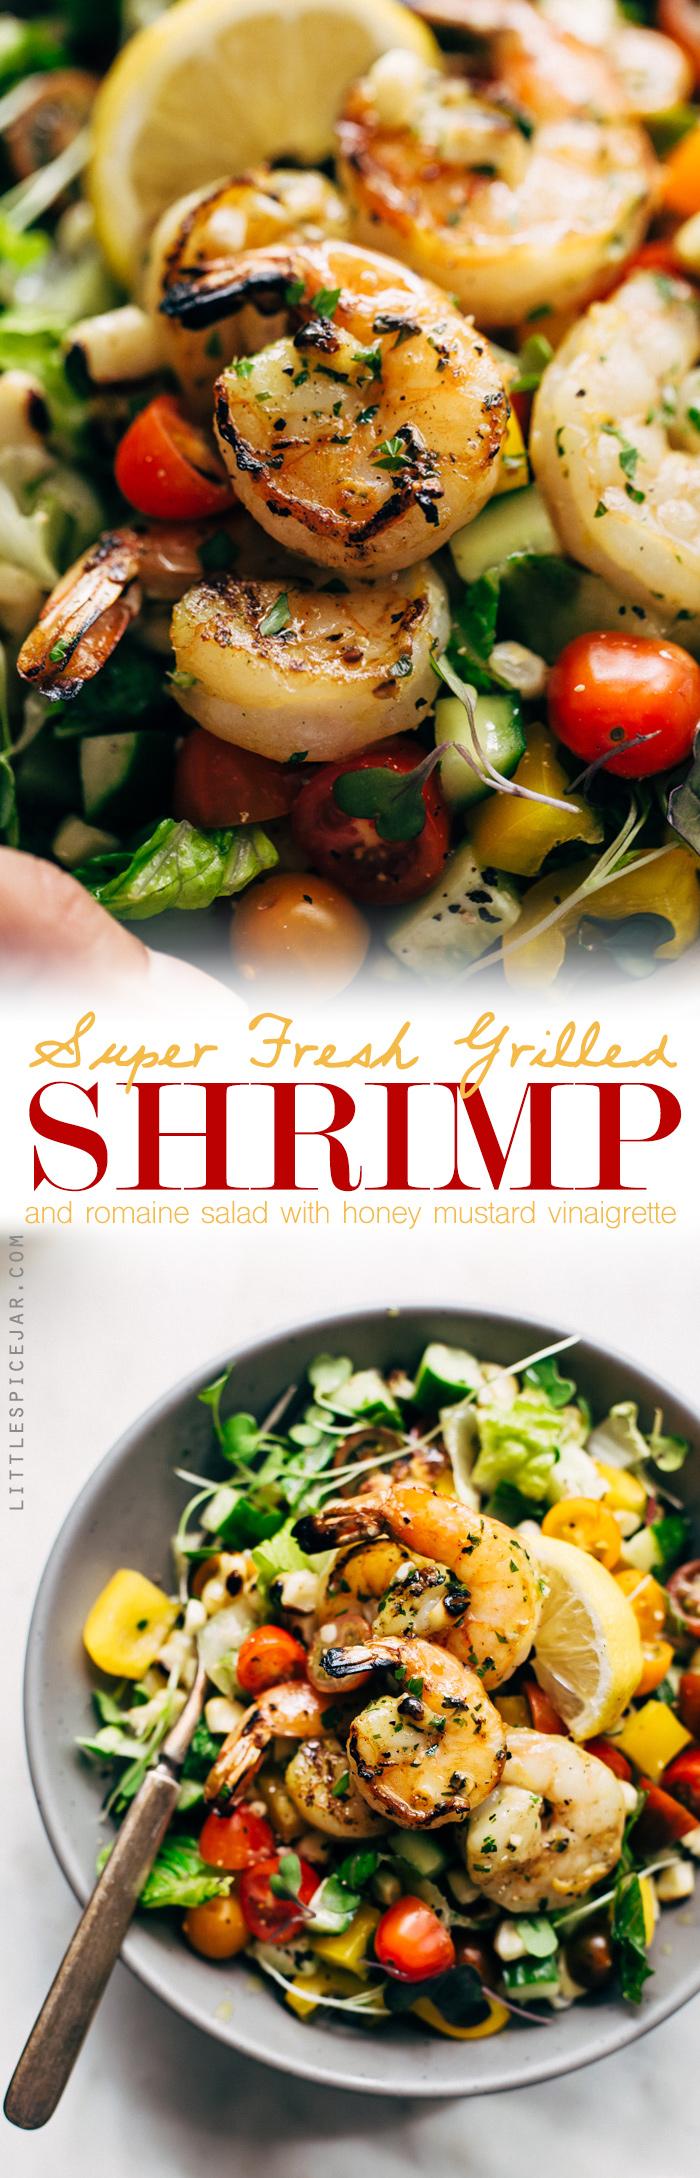 Super Fresh Grilled Shrimp Salad with Honey Mustard Vinaigrette - a simple salad with grilled romaine, shrimp, corn, and peppers. Top if off with the honey mustard dressing! #shrimpsalad #grilledromaine #grilledshrimp #salad   Littlespicejar.com